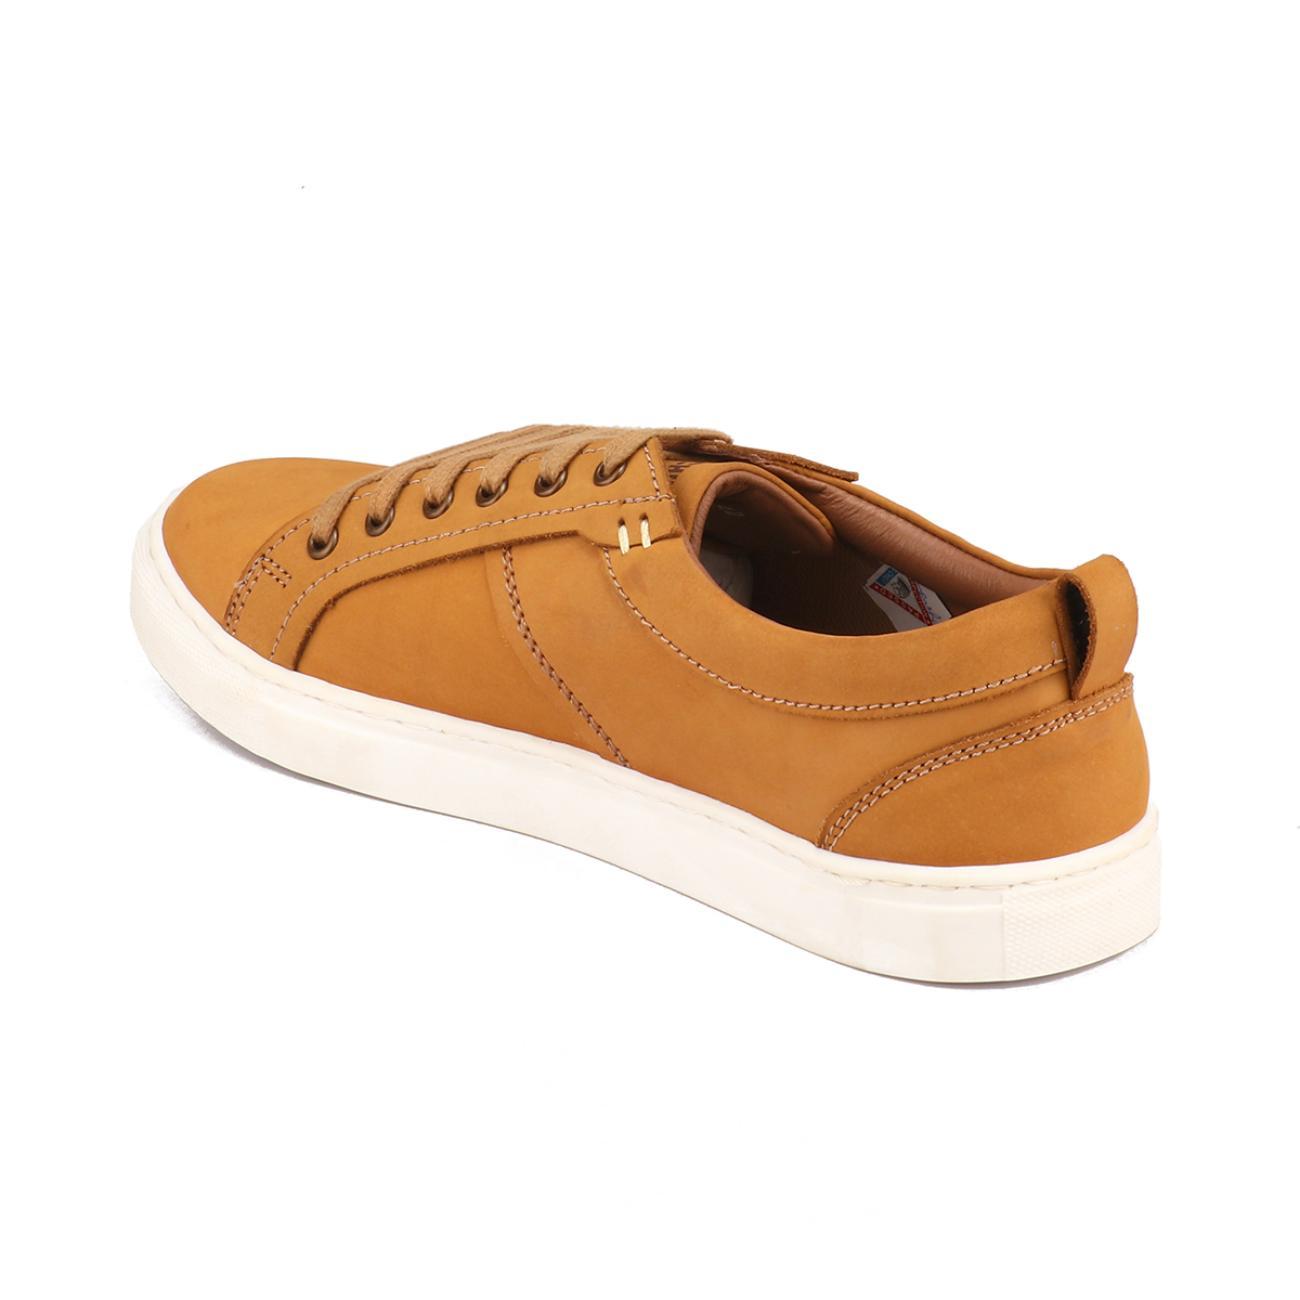 buy rust casual sneakers side view_1